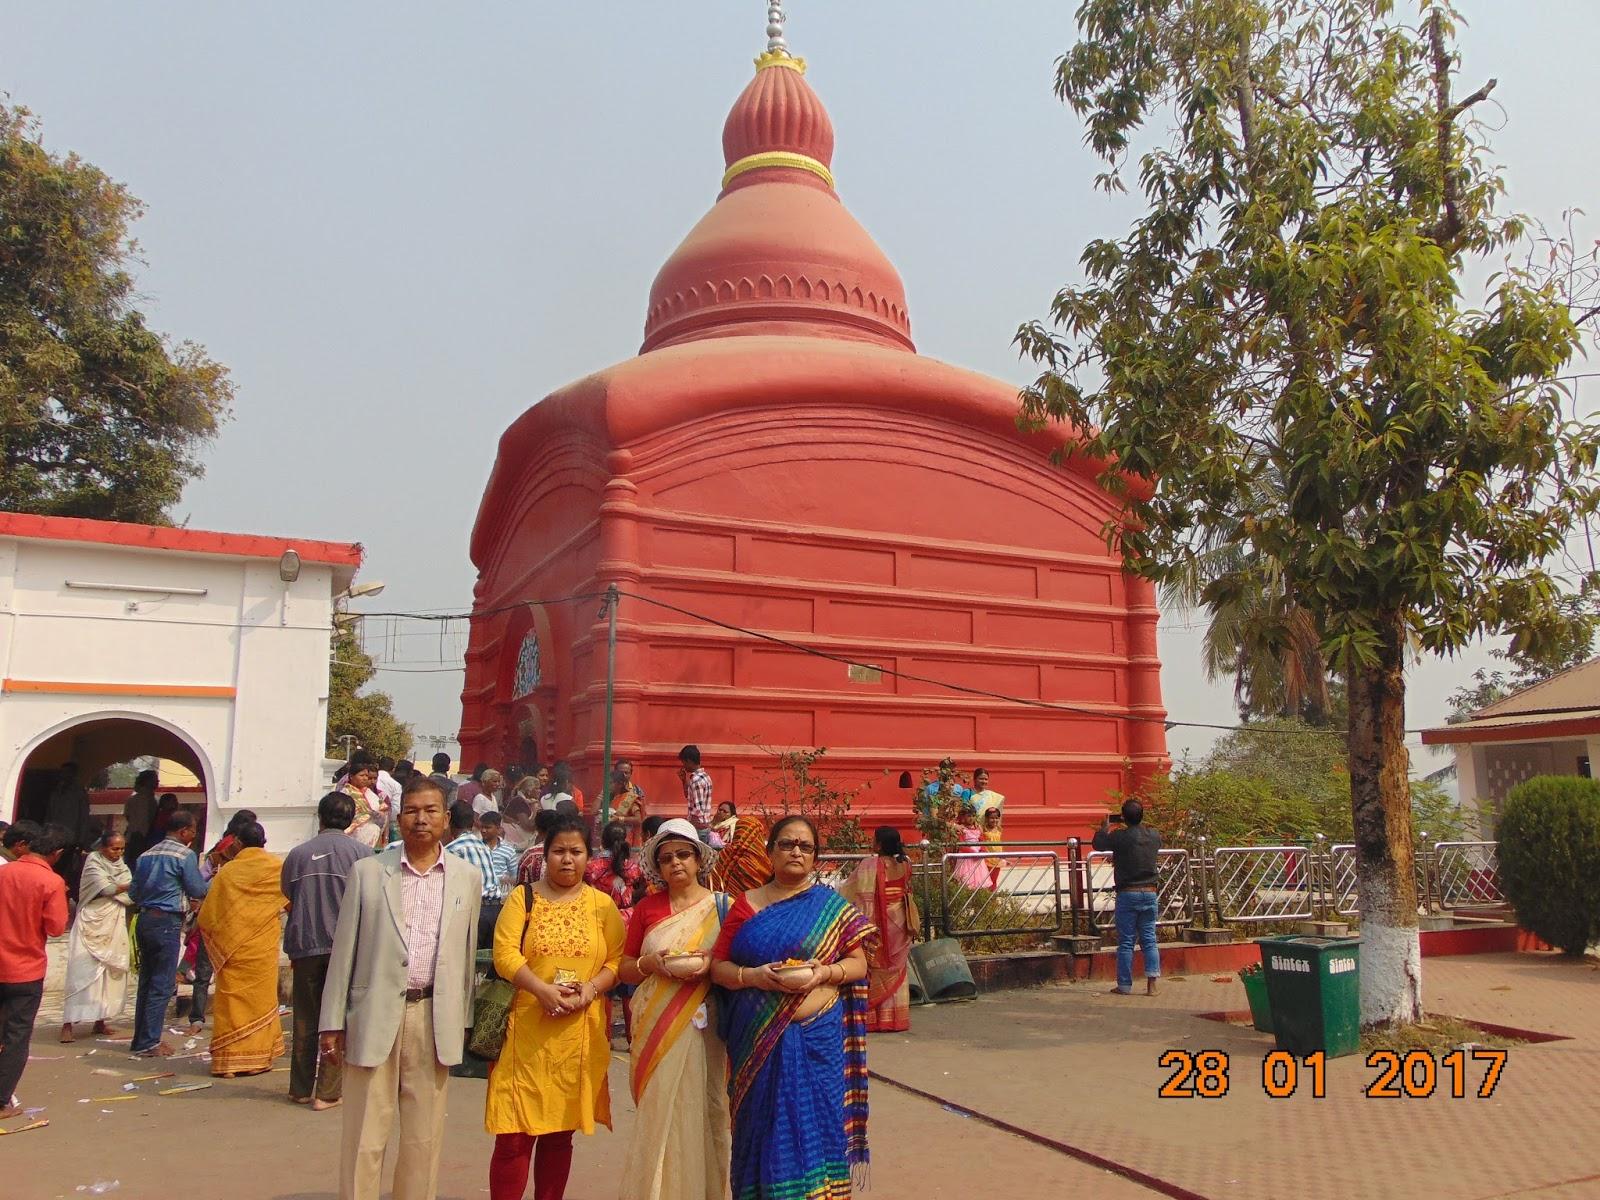 Must Visit Place In Tripura-Udaipur, Tripura Sundari Temple